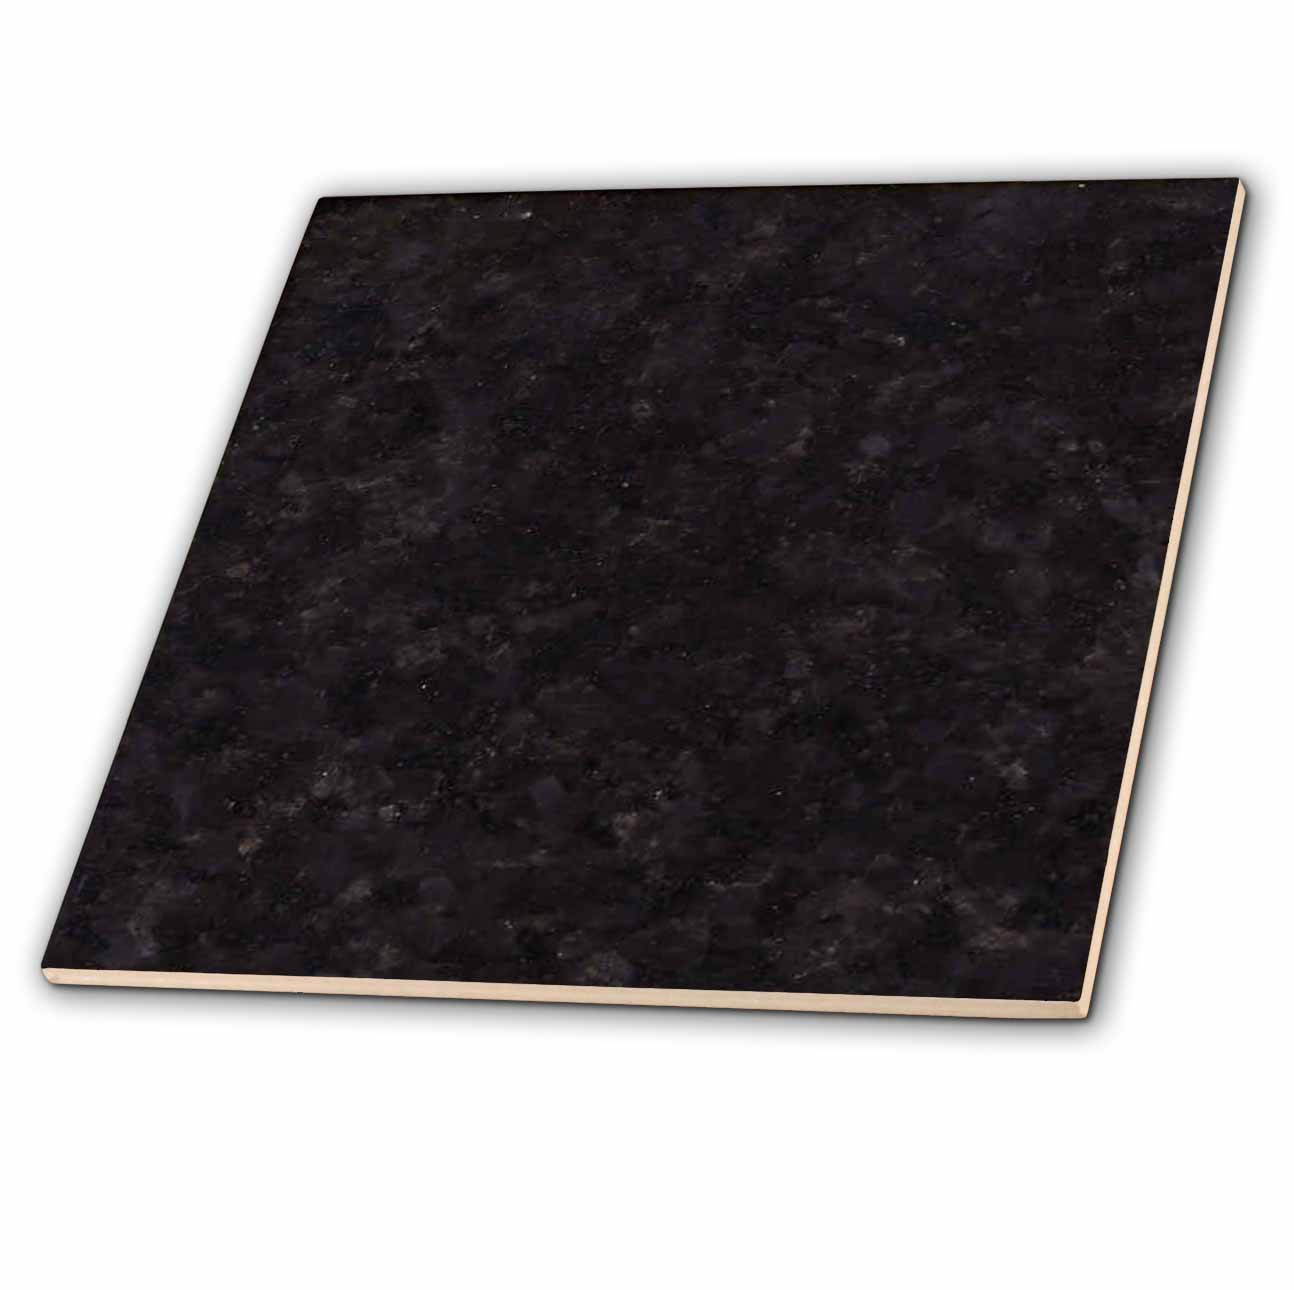 3dRose Black Pearl granite print - Ceramic Tile, 12-inch